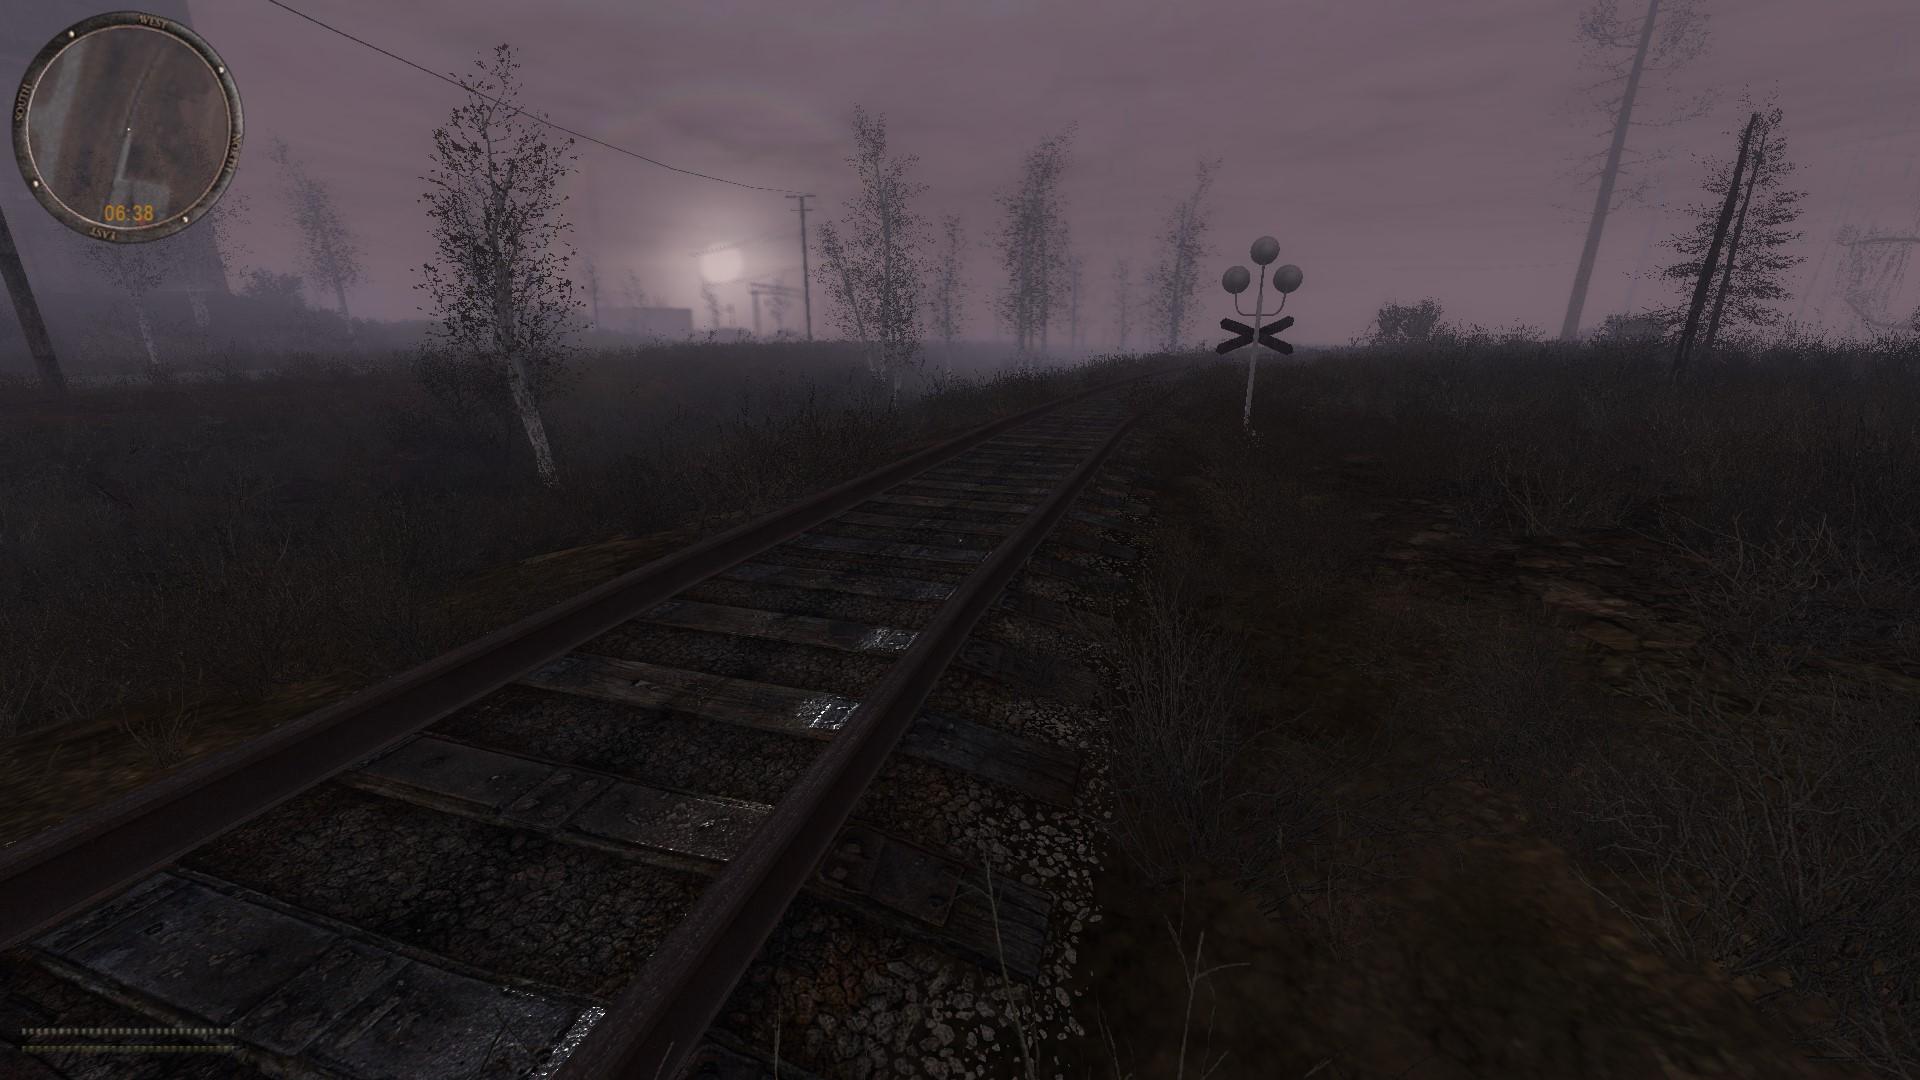 ss_Администратор_05-04-18_21-04-50_(jupiter).jpg - S.T.A.L.K.E.R.: Call of Pripyat